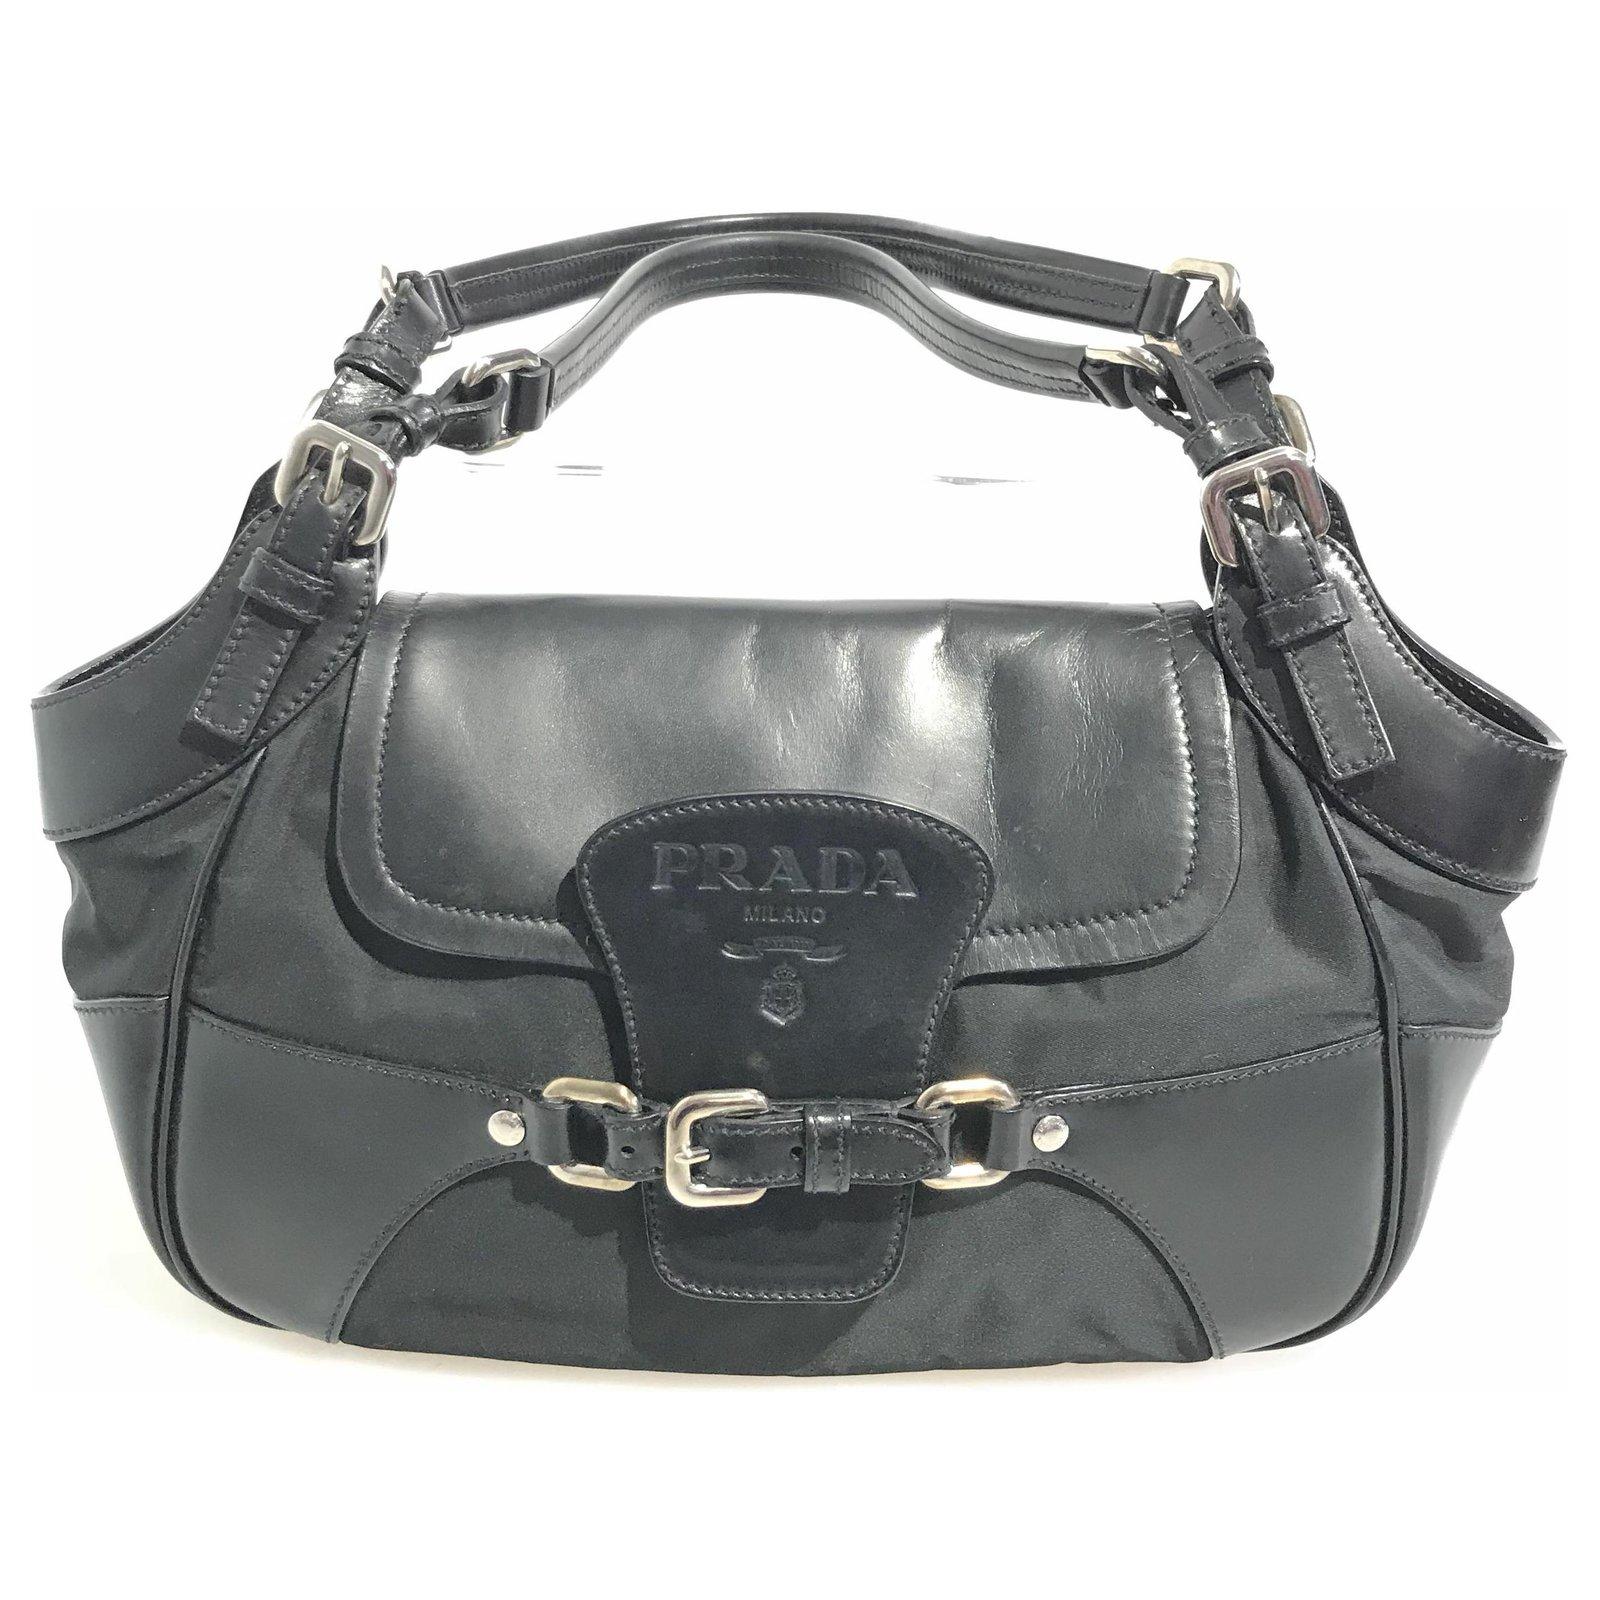 cb888bd84a89 Prada Prada Black Tessuto Shoulder Bag Handbags Leather,Other,Nylon,Cloth  Black ref